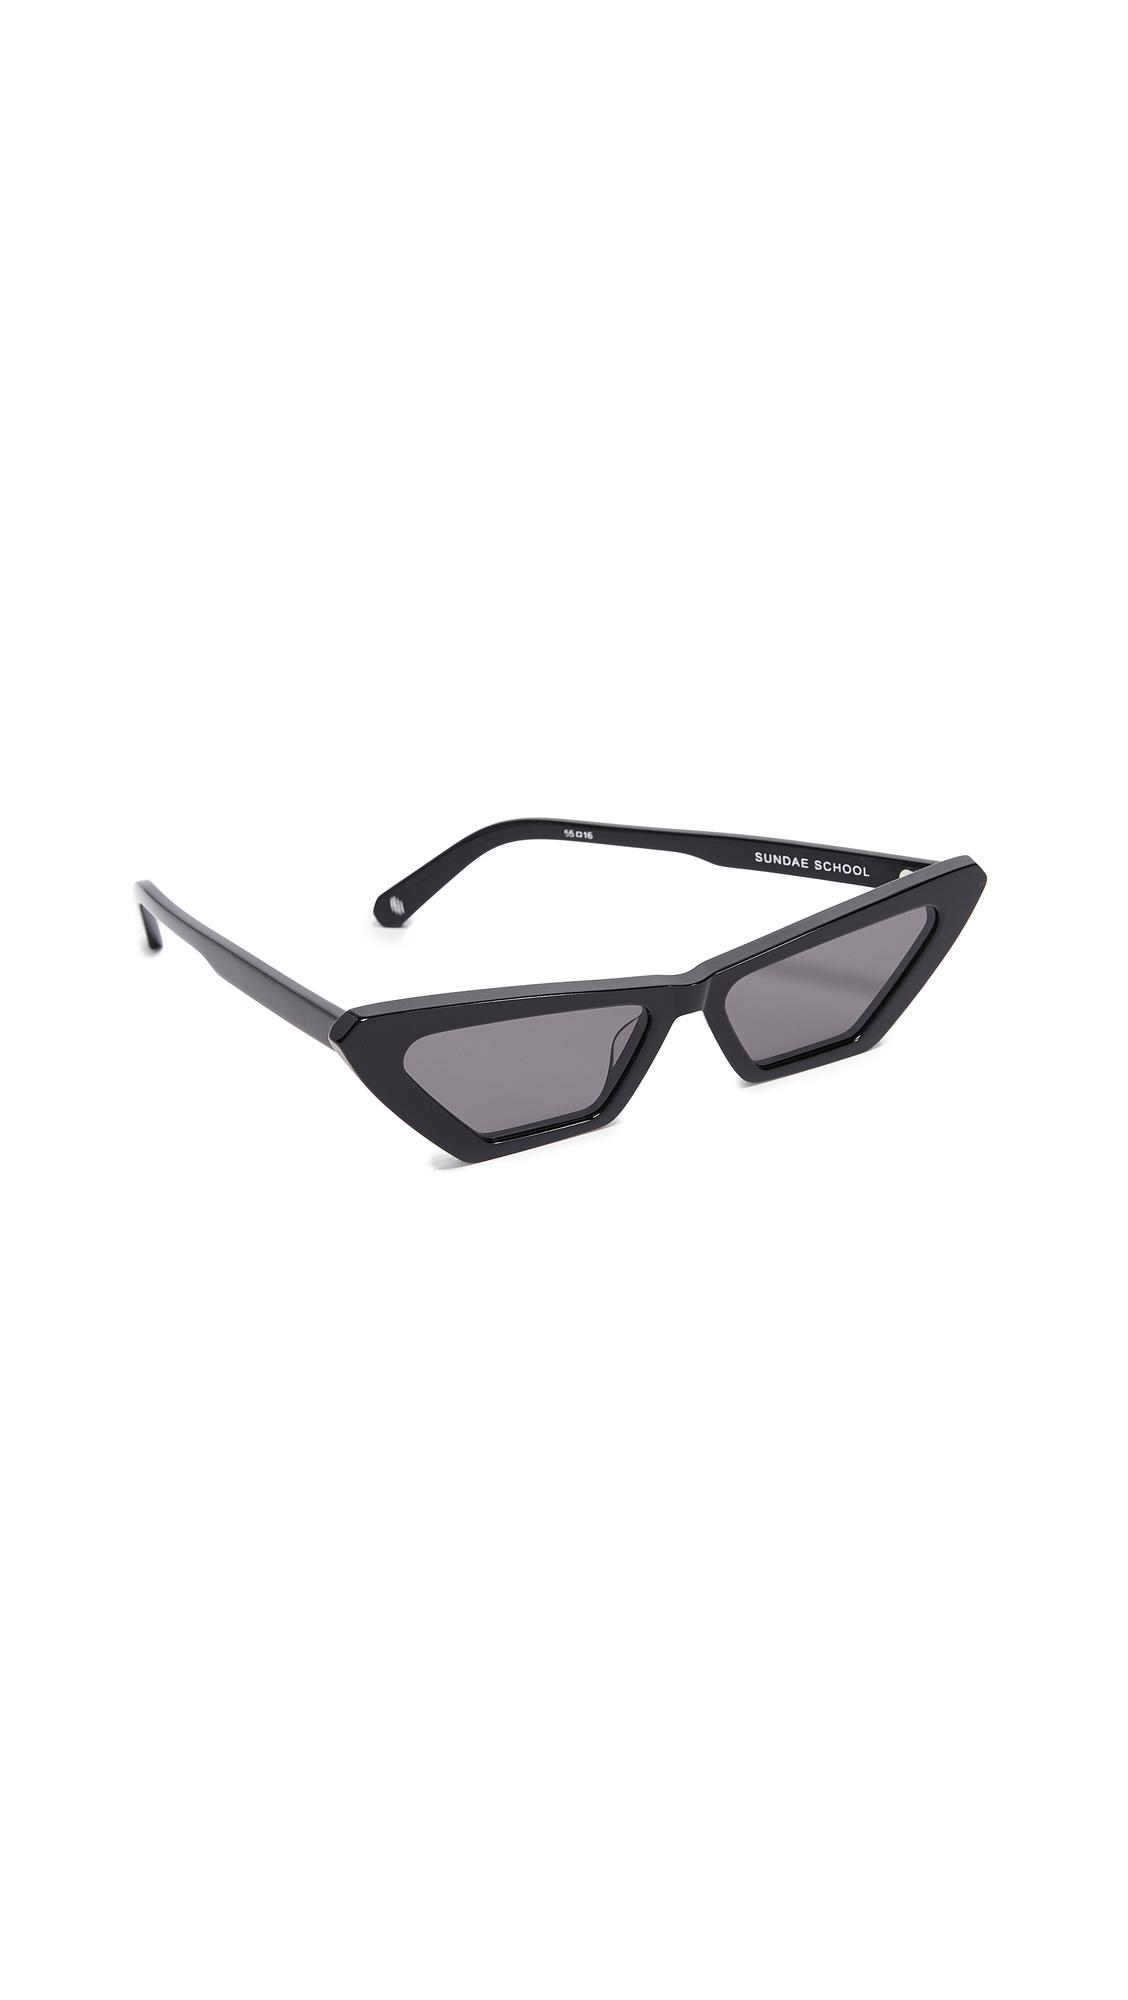 CHIMI X Sundae School Square Sunglasses in Black